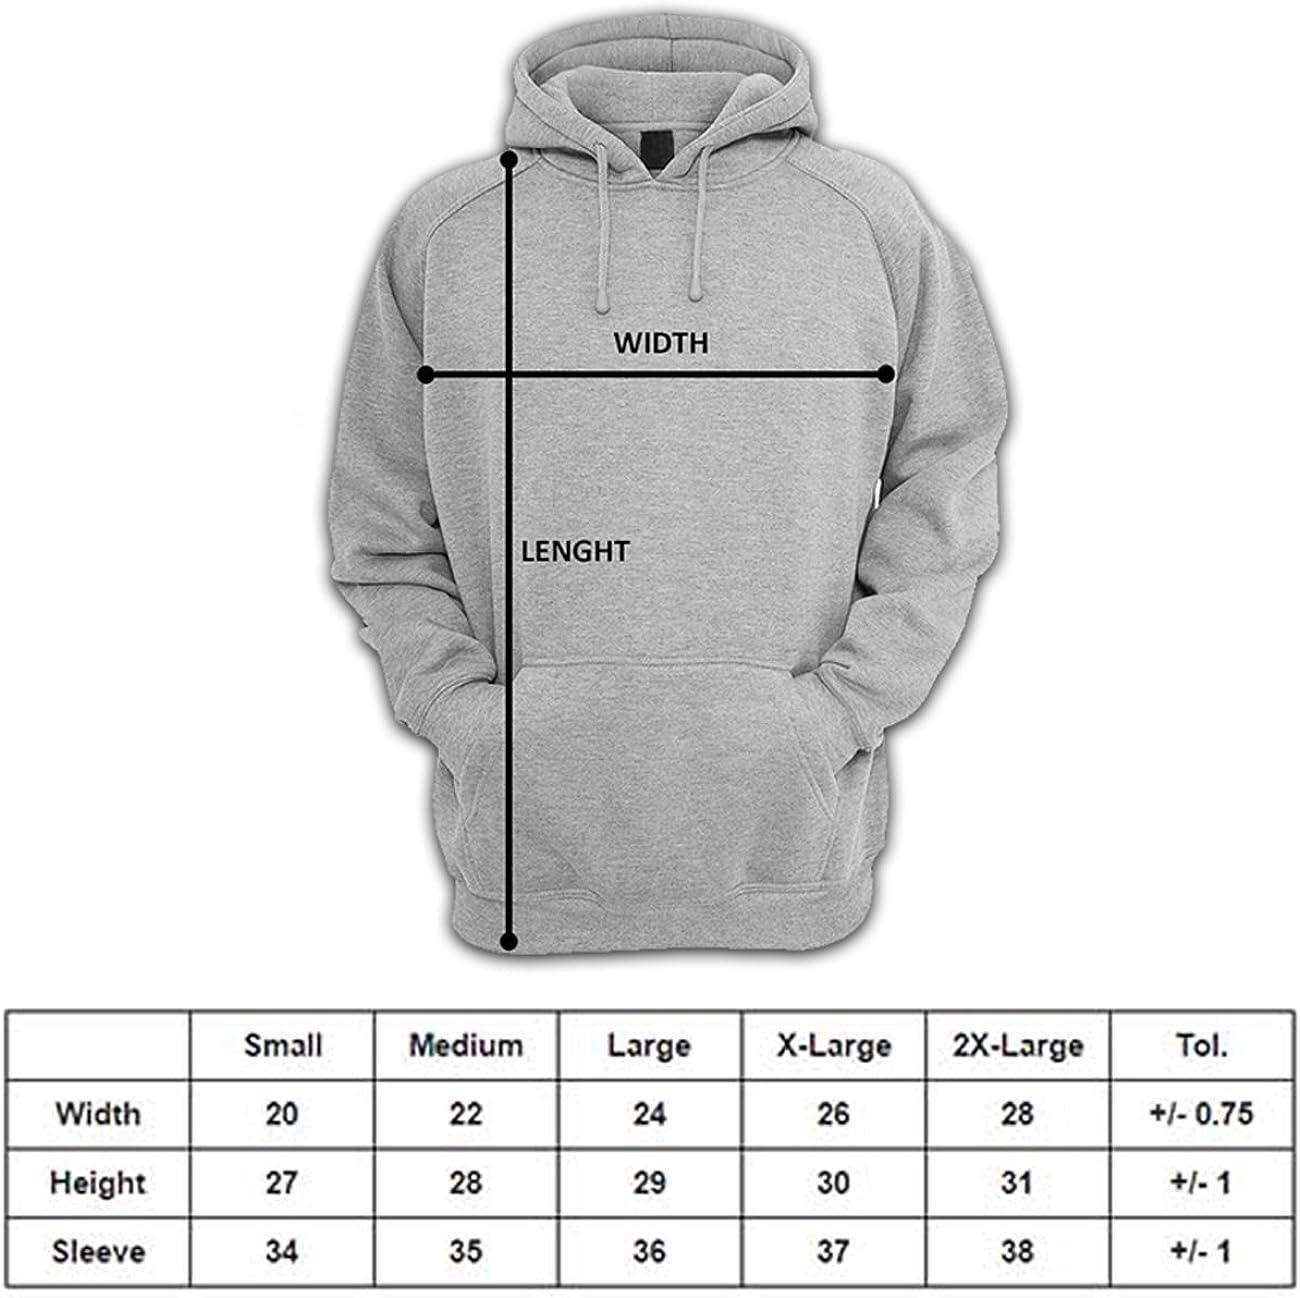 White Cartoon Hands and Diamond Designed Unisex Adult Hoodies Sweatshirts